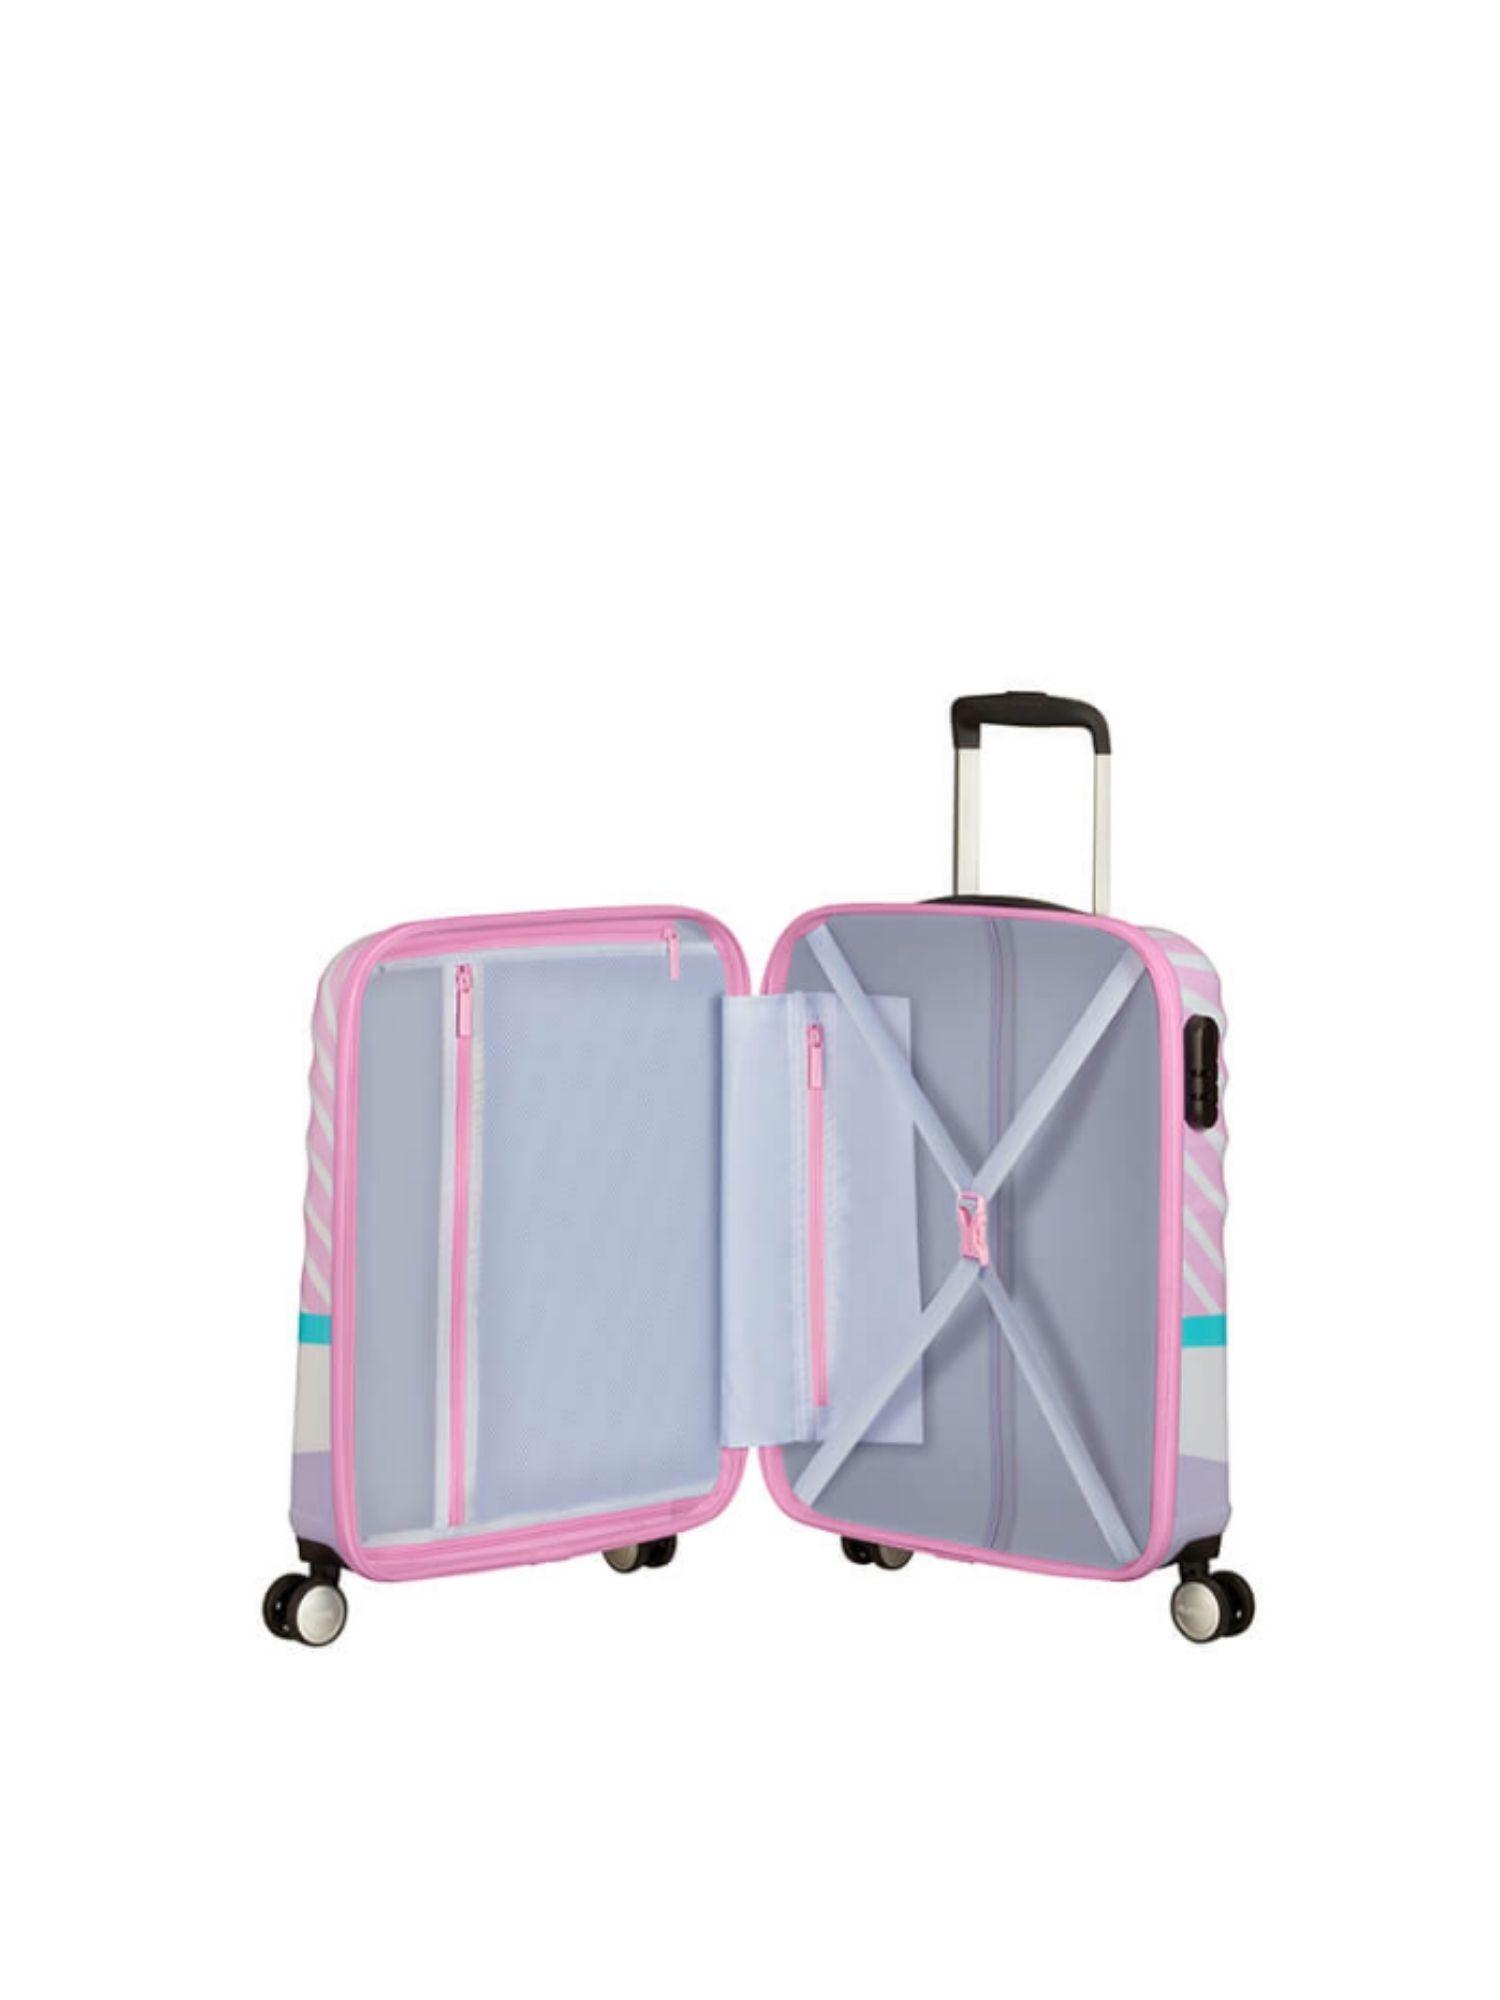 Trolley American Tourister 4 ruote 55 cm. Wavebreaker Disney Daisy Pink Kiss aperta